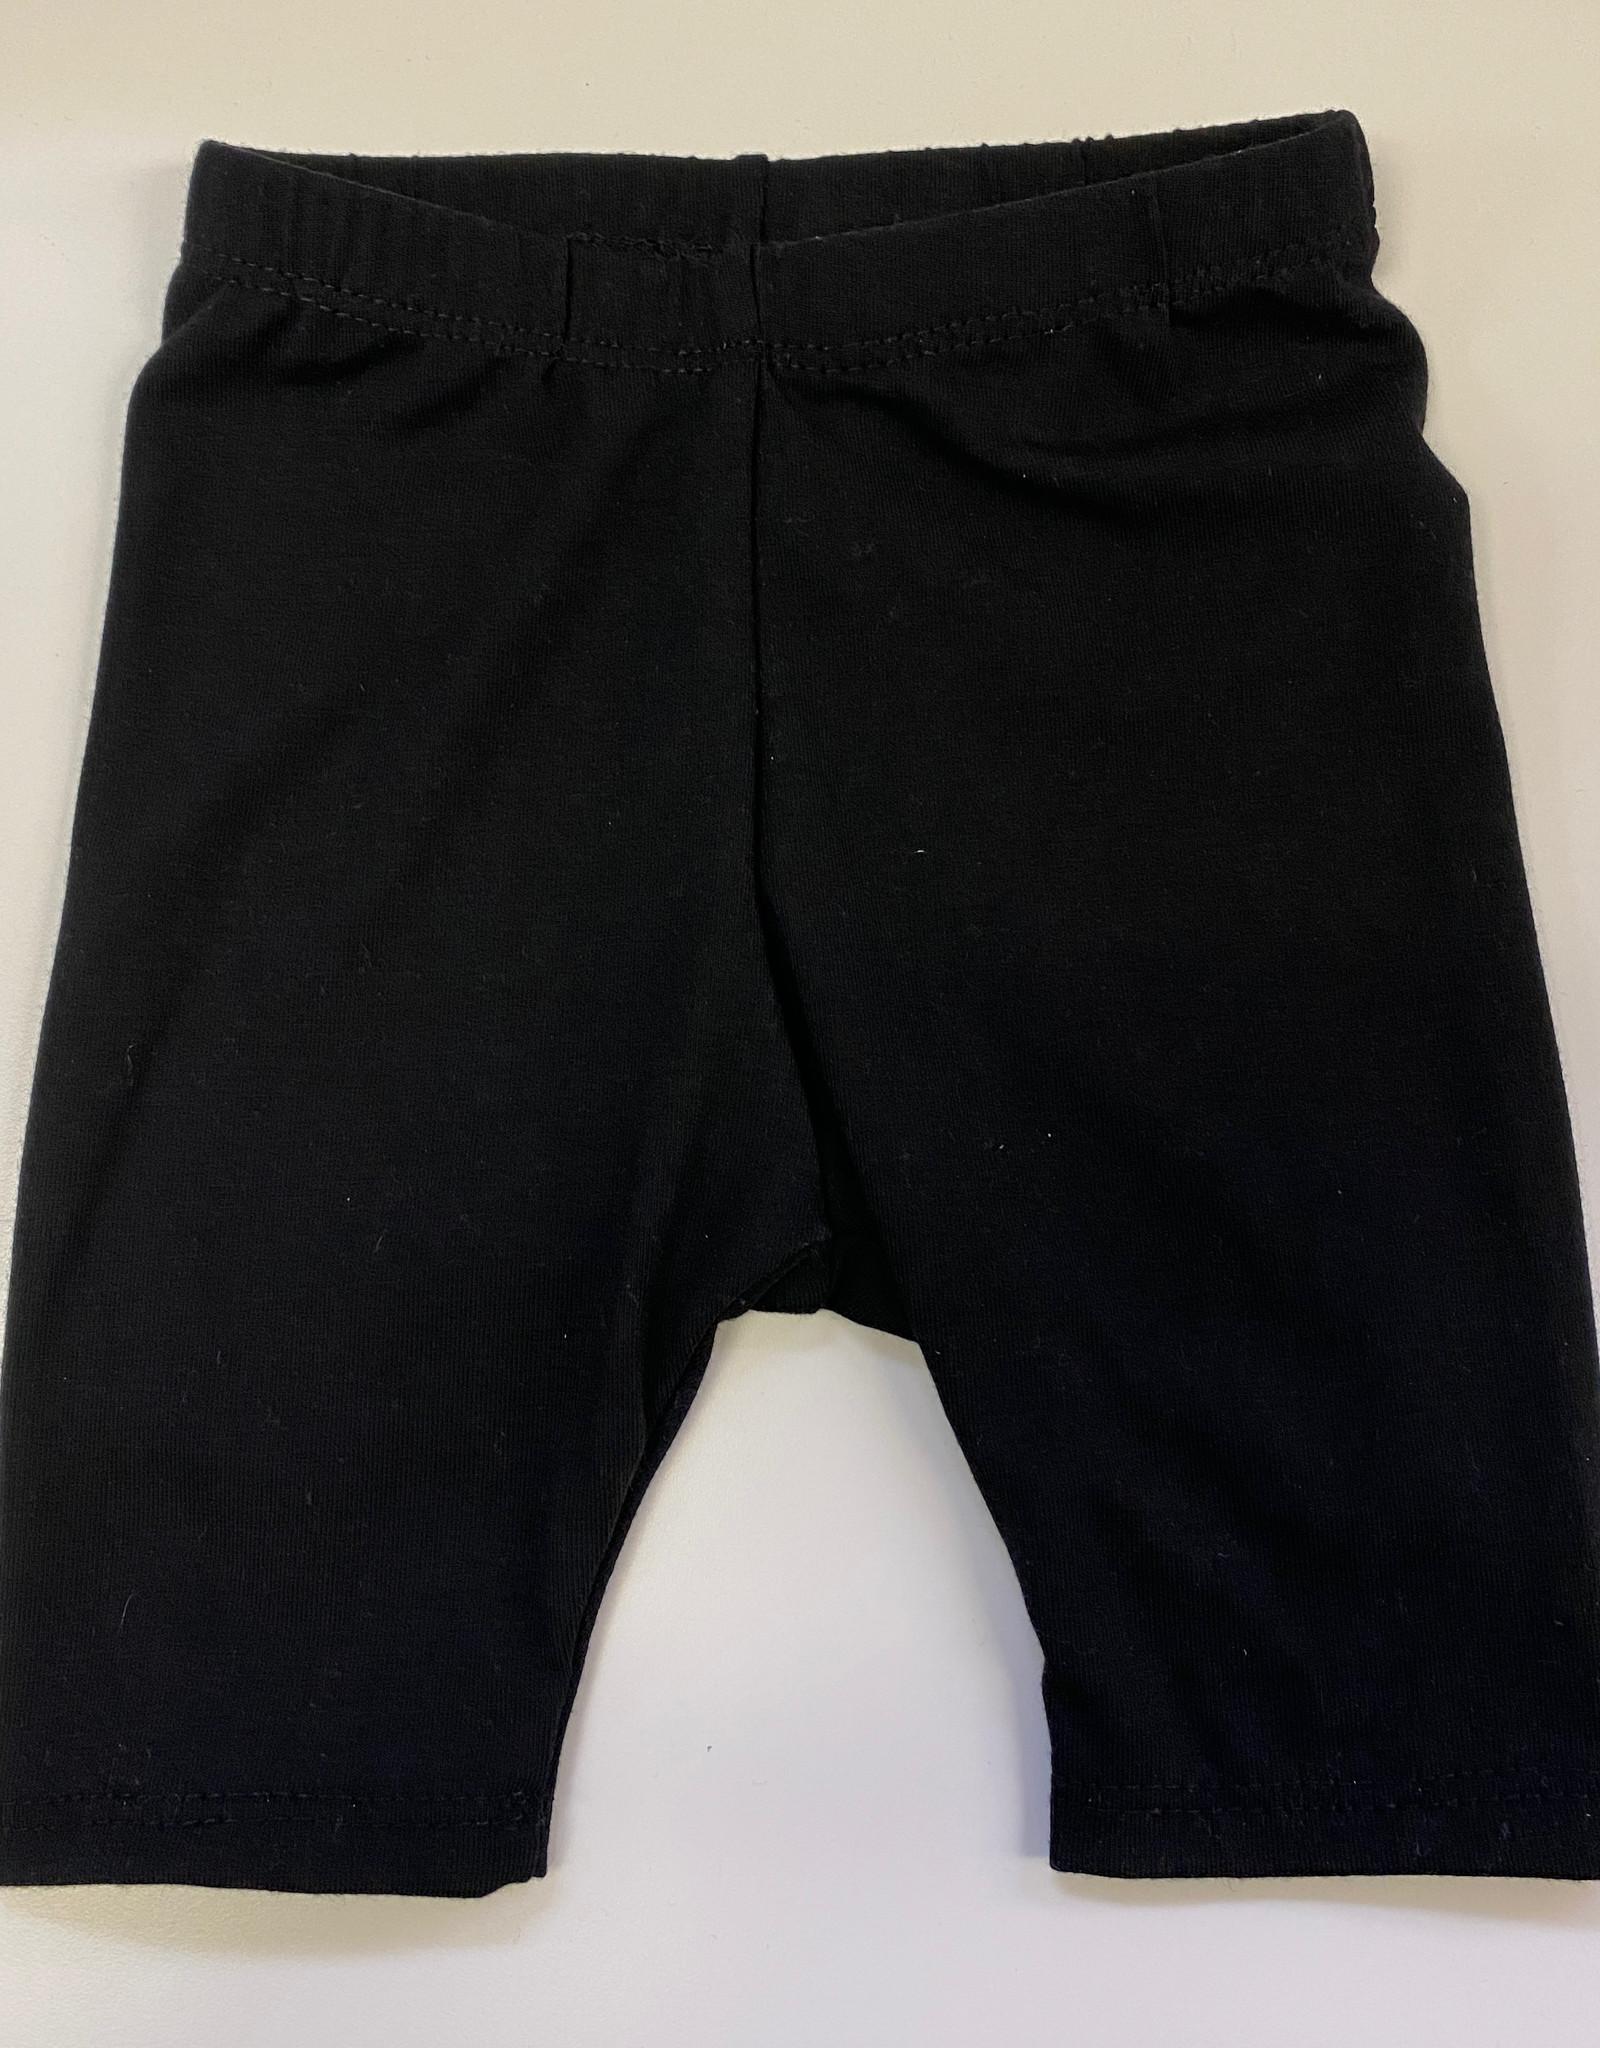 Posh & Cozy SP21 Bike Shorts - Black